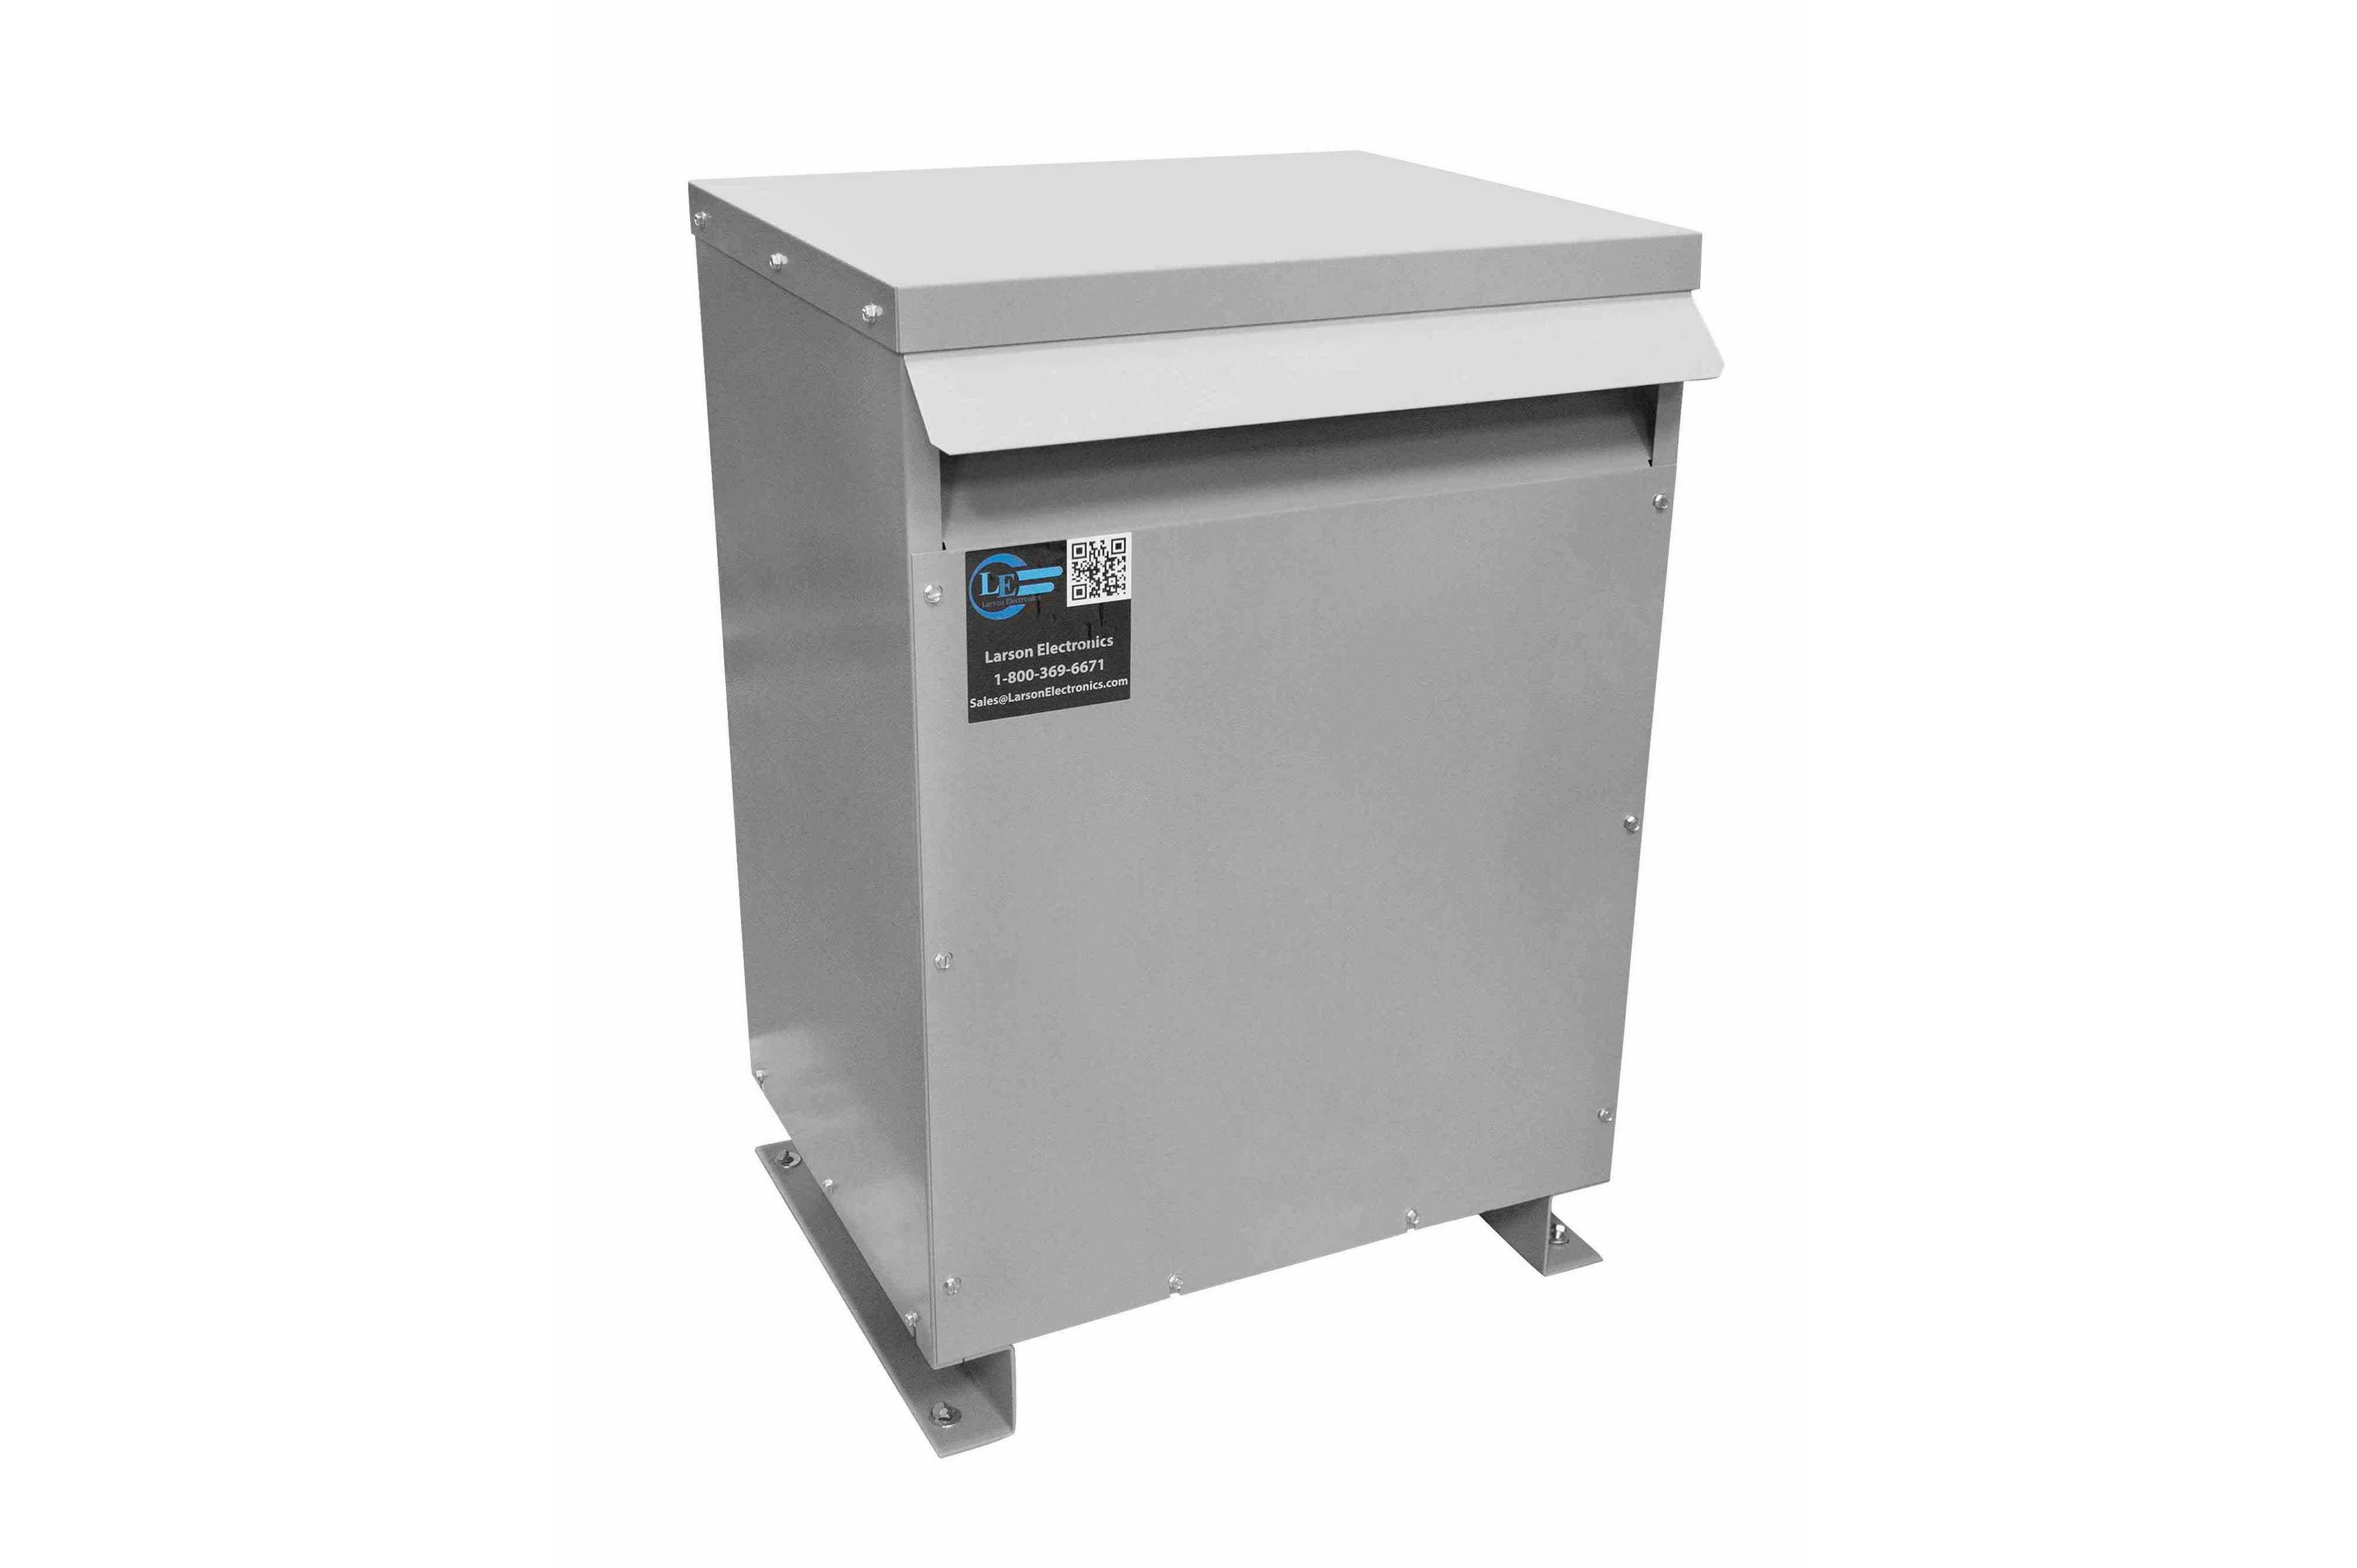 52.5 kVA 3PH Isolation Transformer, 600V Wye Primary, 400V Delta Secondary, N3R, Ventilated, 60 Hz